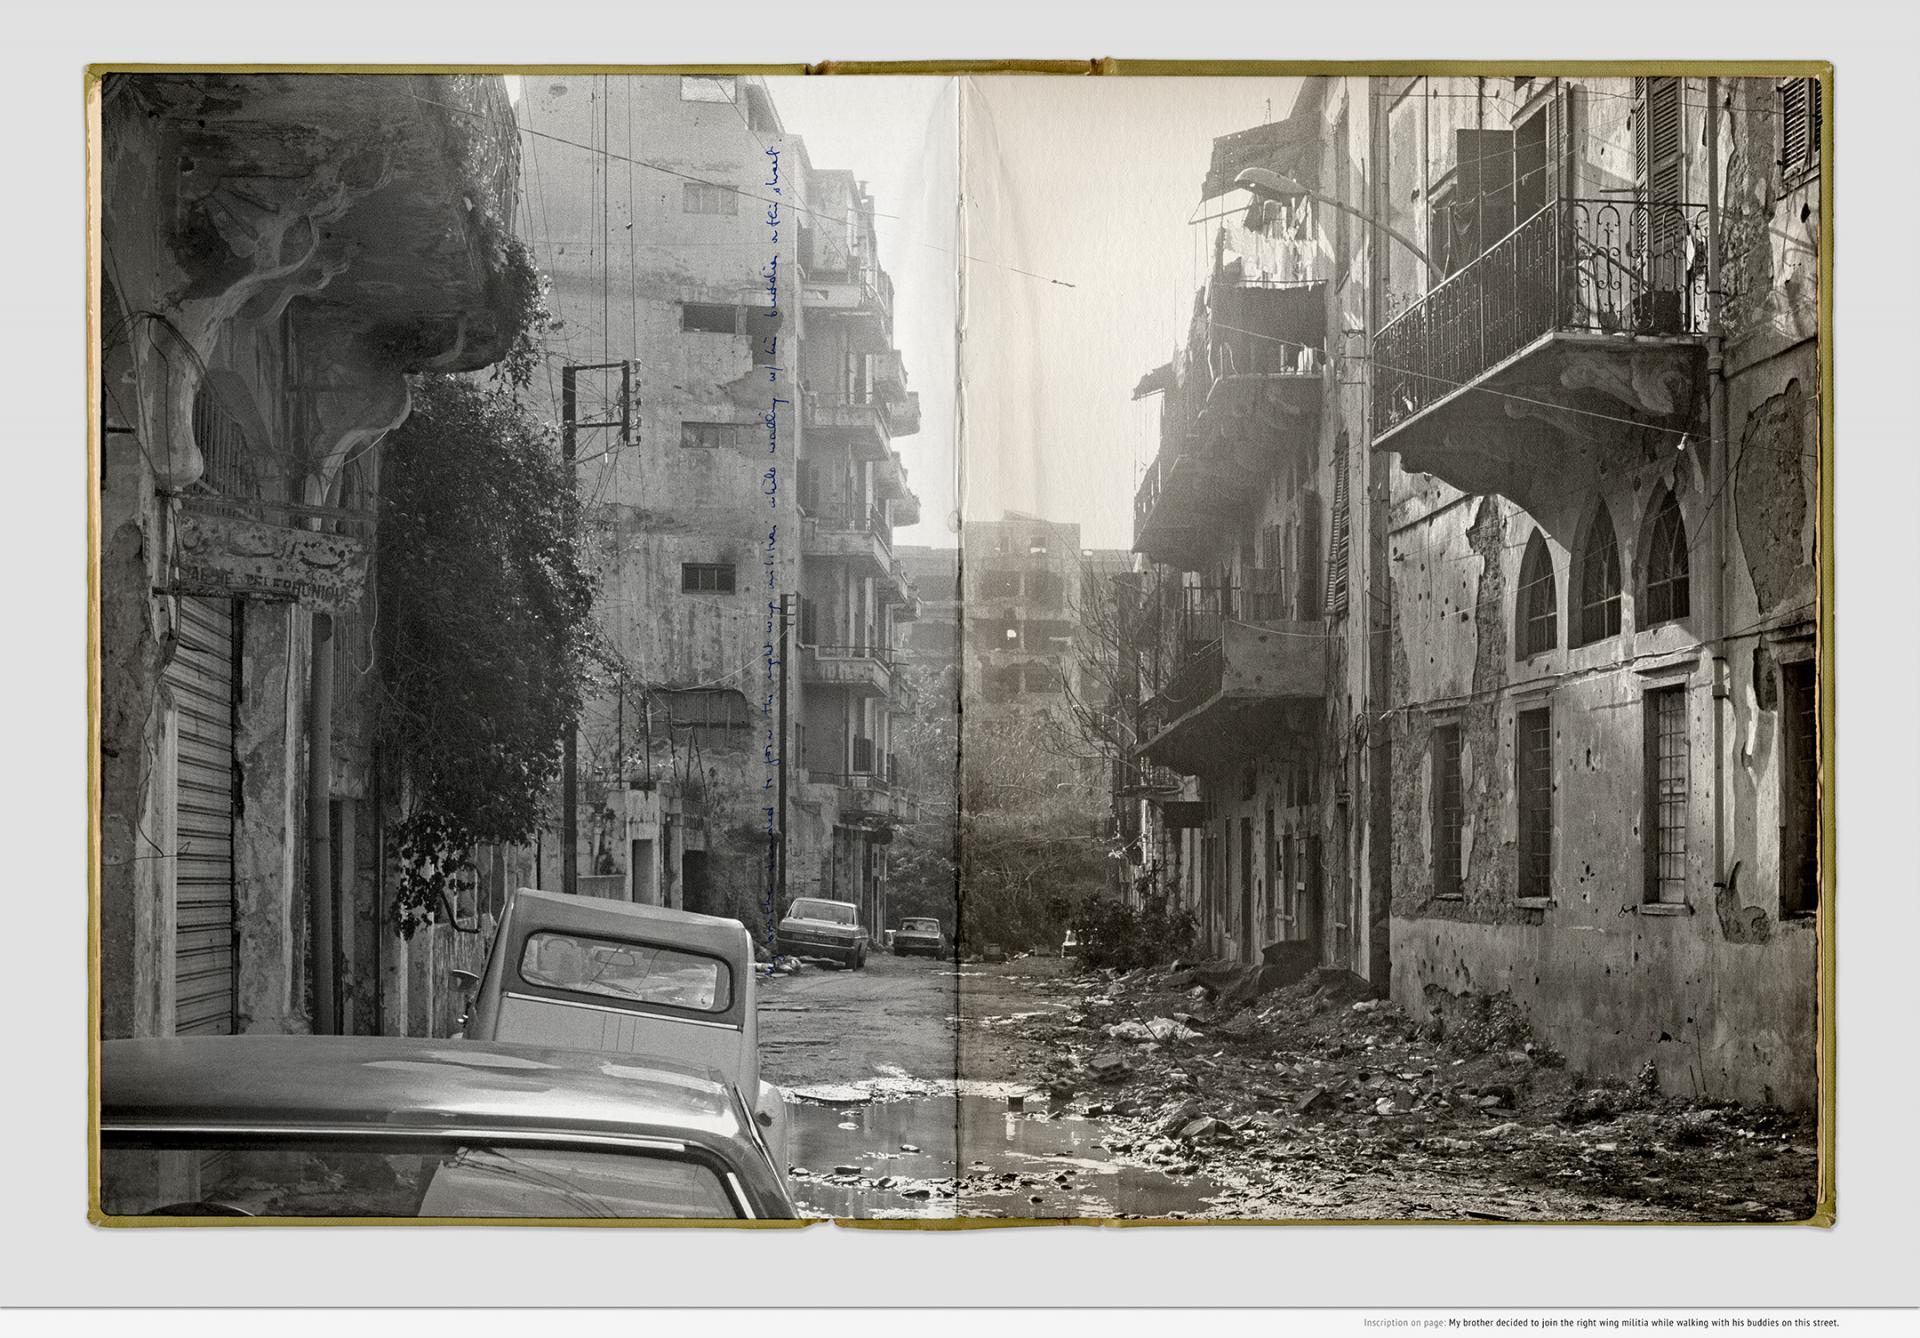 Sweet Talk. Commissions (Beirut) _ 1987.008, 1987-2019, inkjet print, 54.3 x 76.3 x 3.5cm, framed